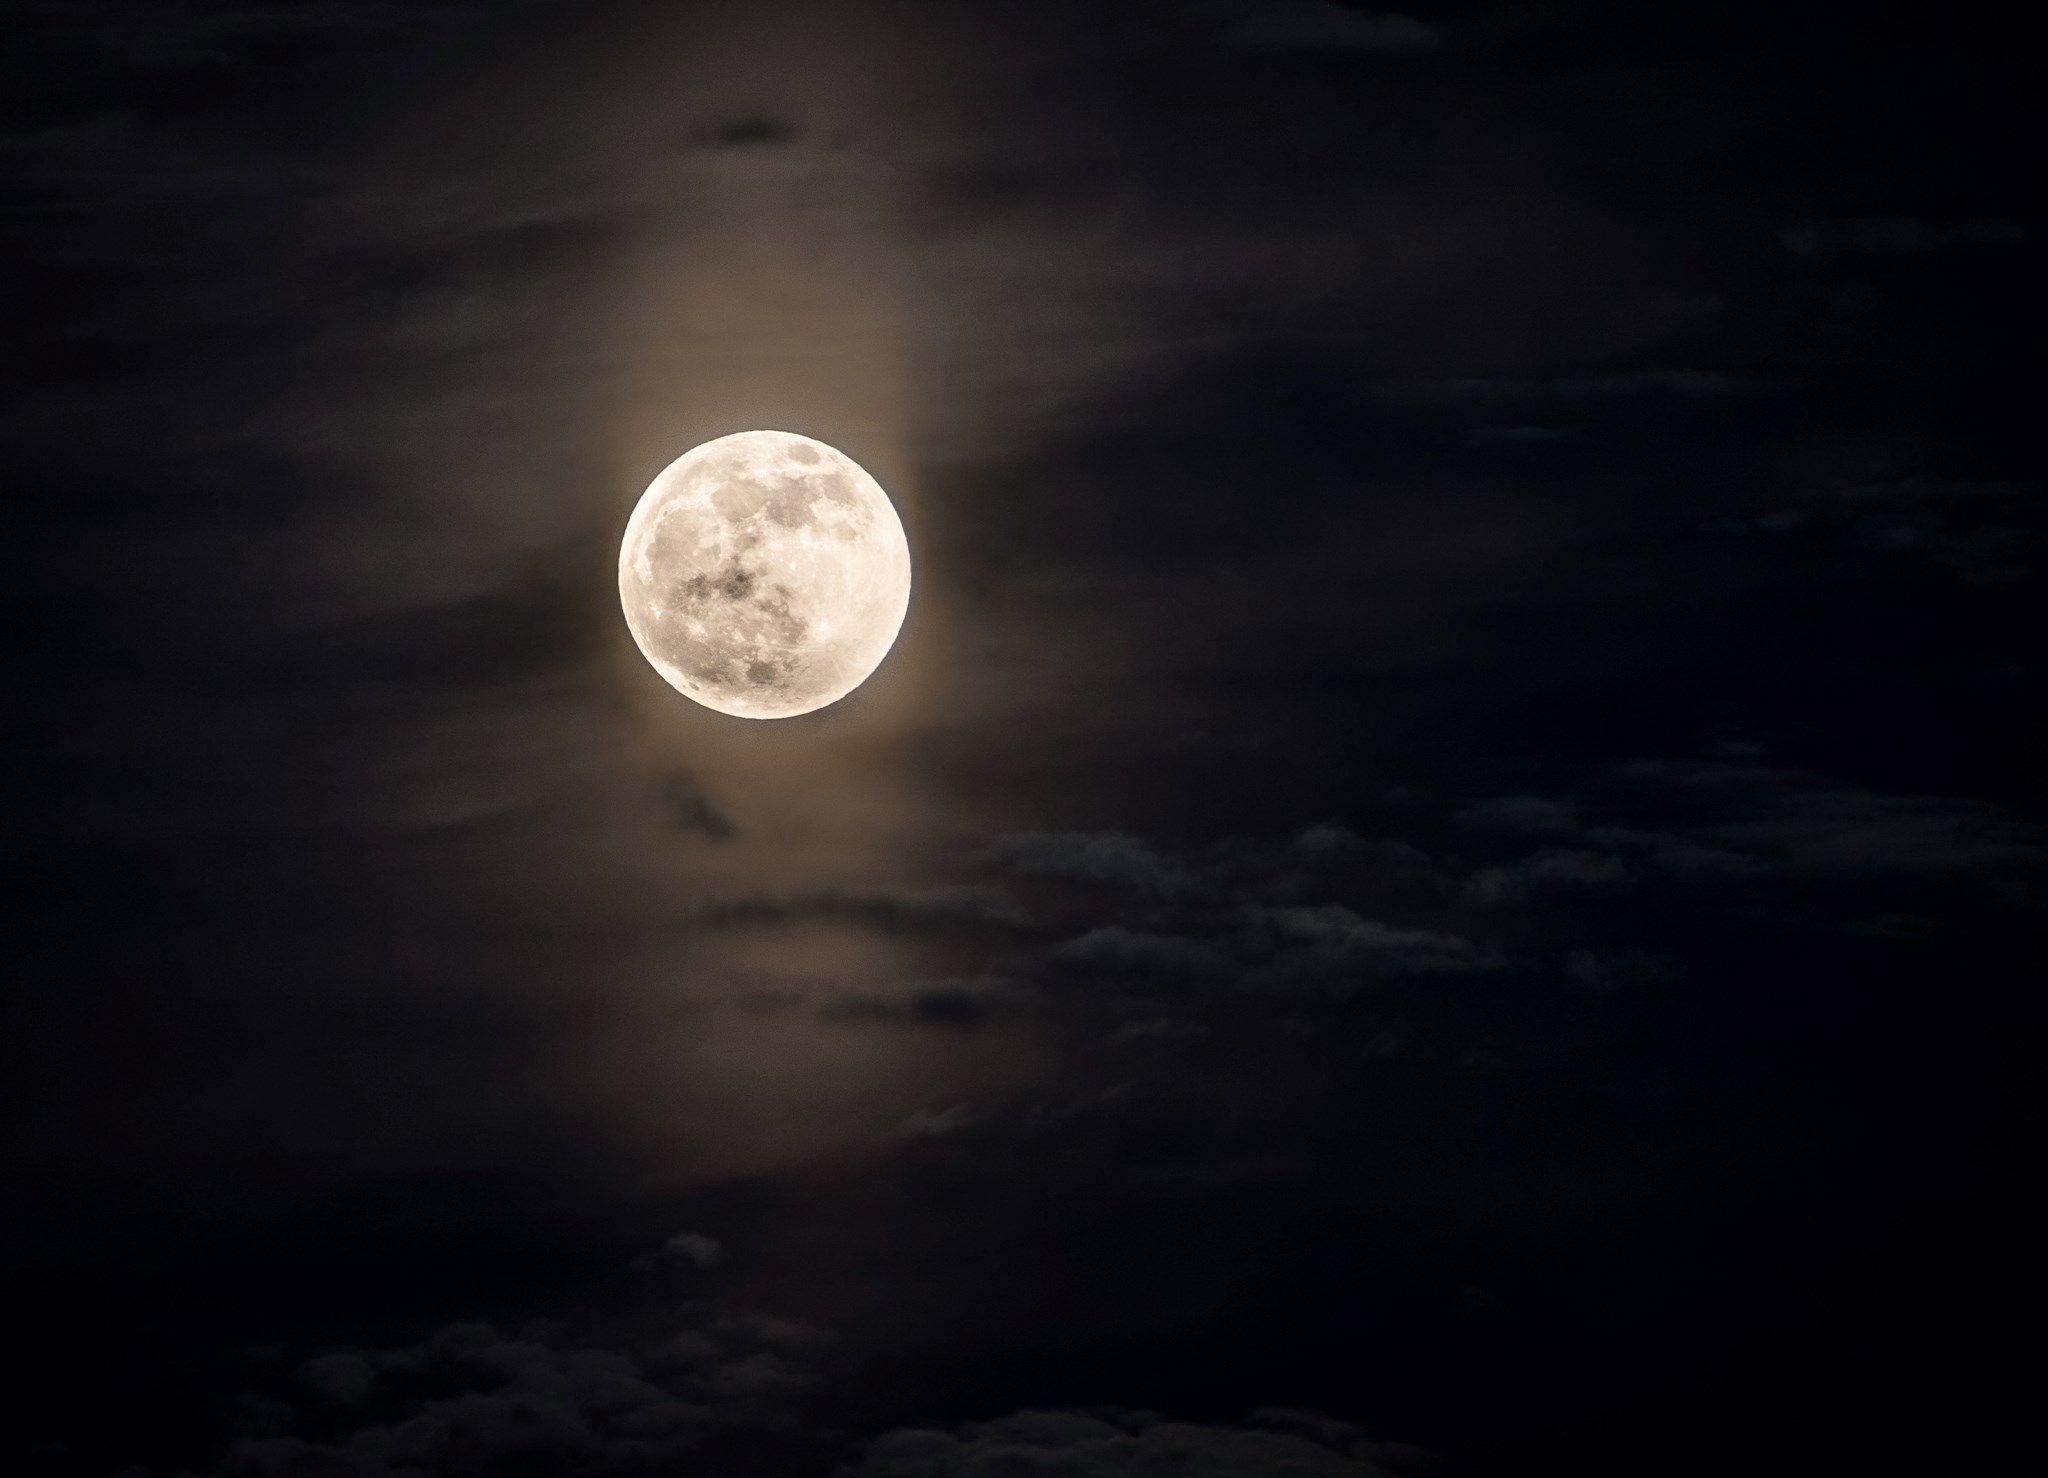 Moon Wallpaper Pack 1080p Hd Full Moon Photos